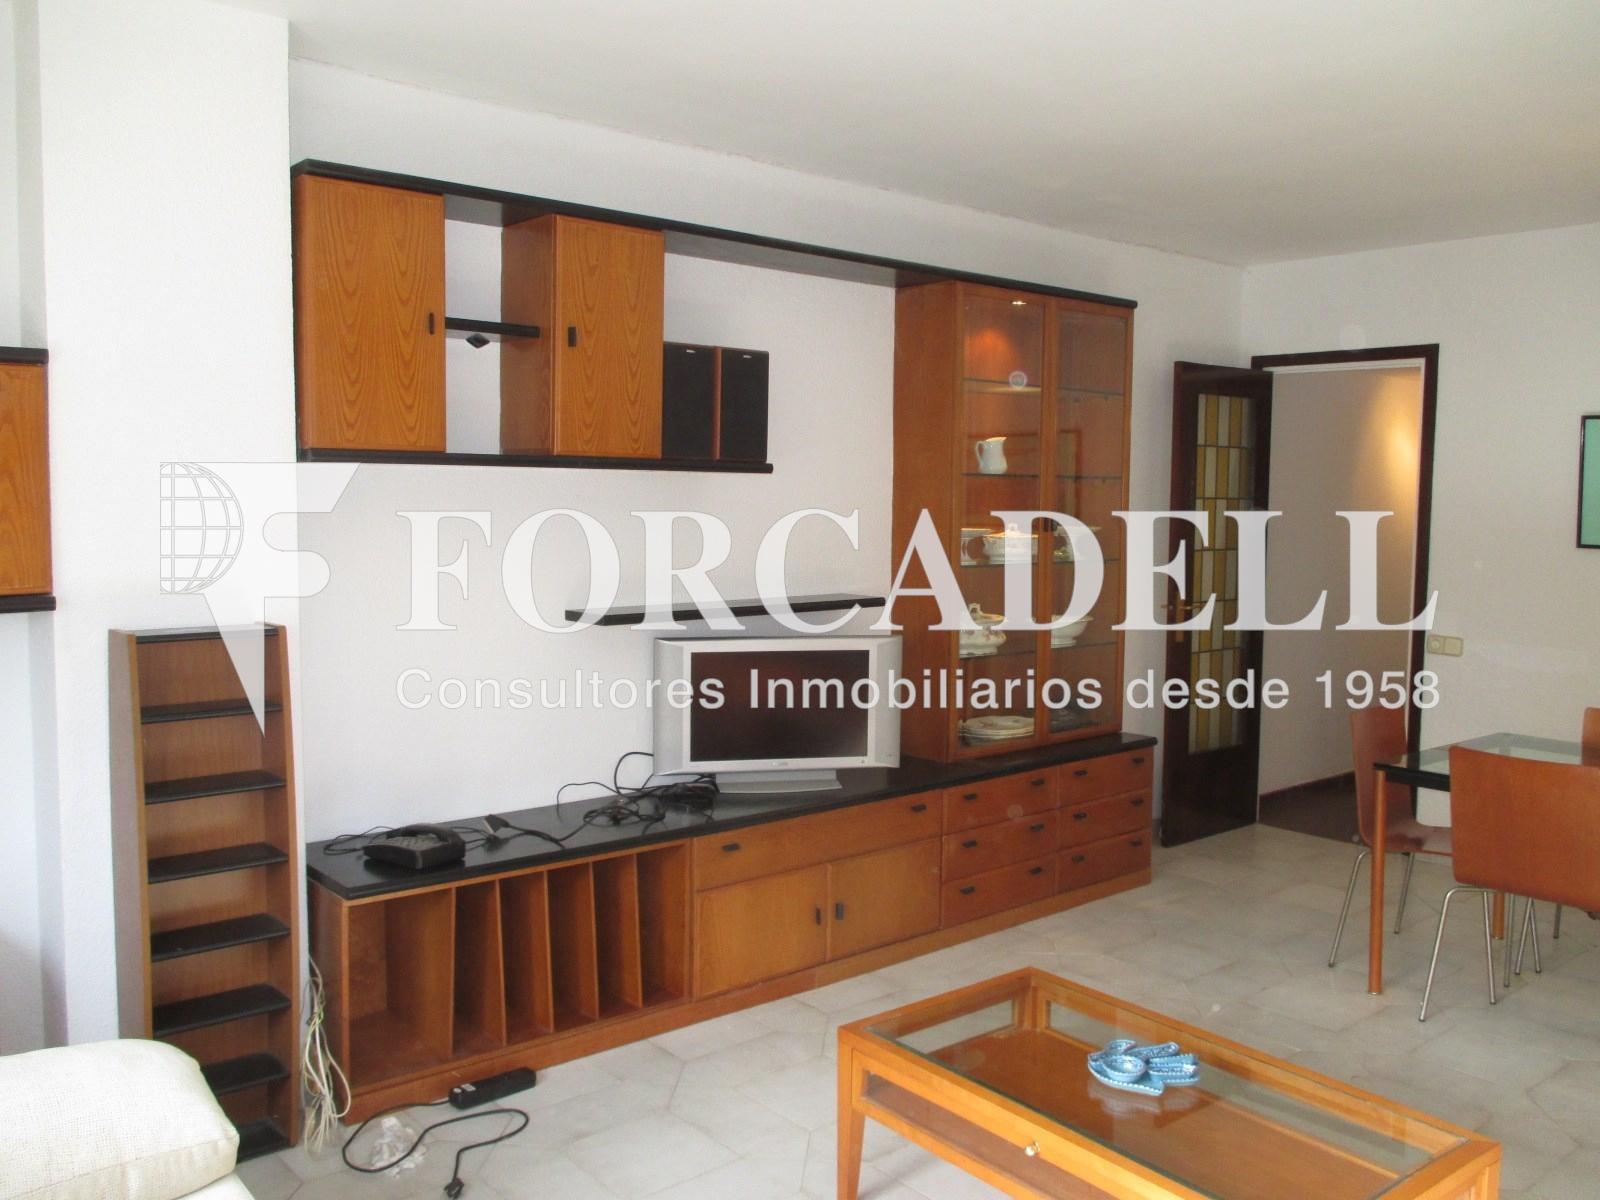 Img_4505 - Piso en alquiler en calle Viladomat, Sant Antoni en Barcelona - 417162367